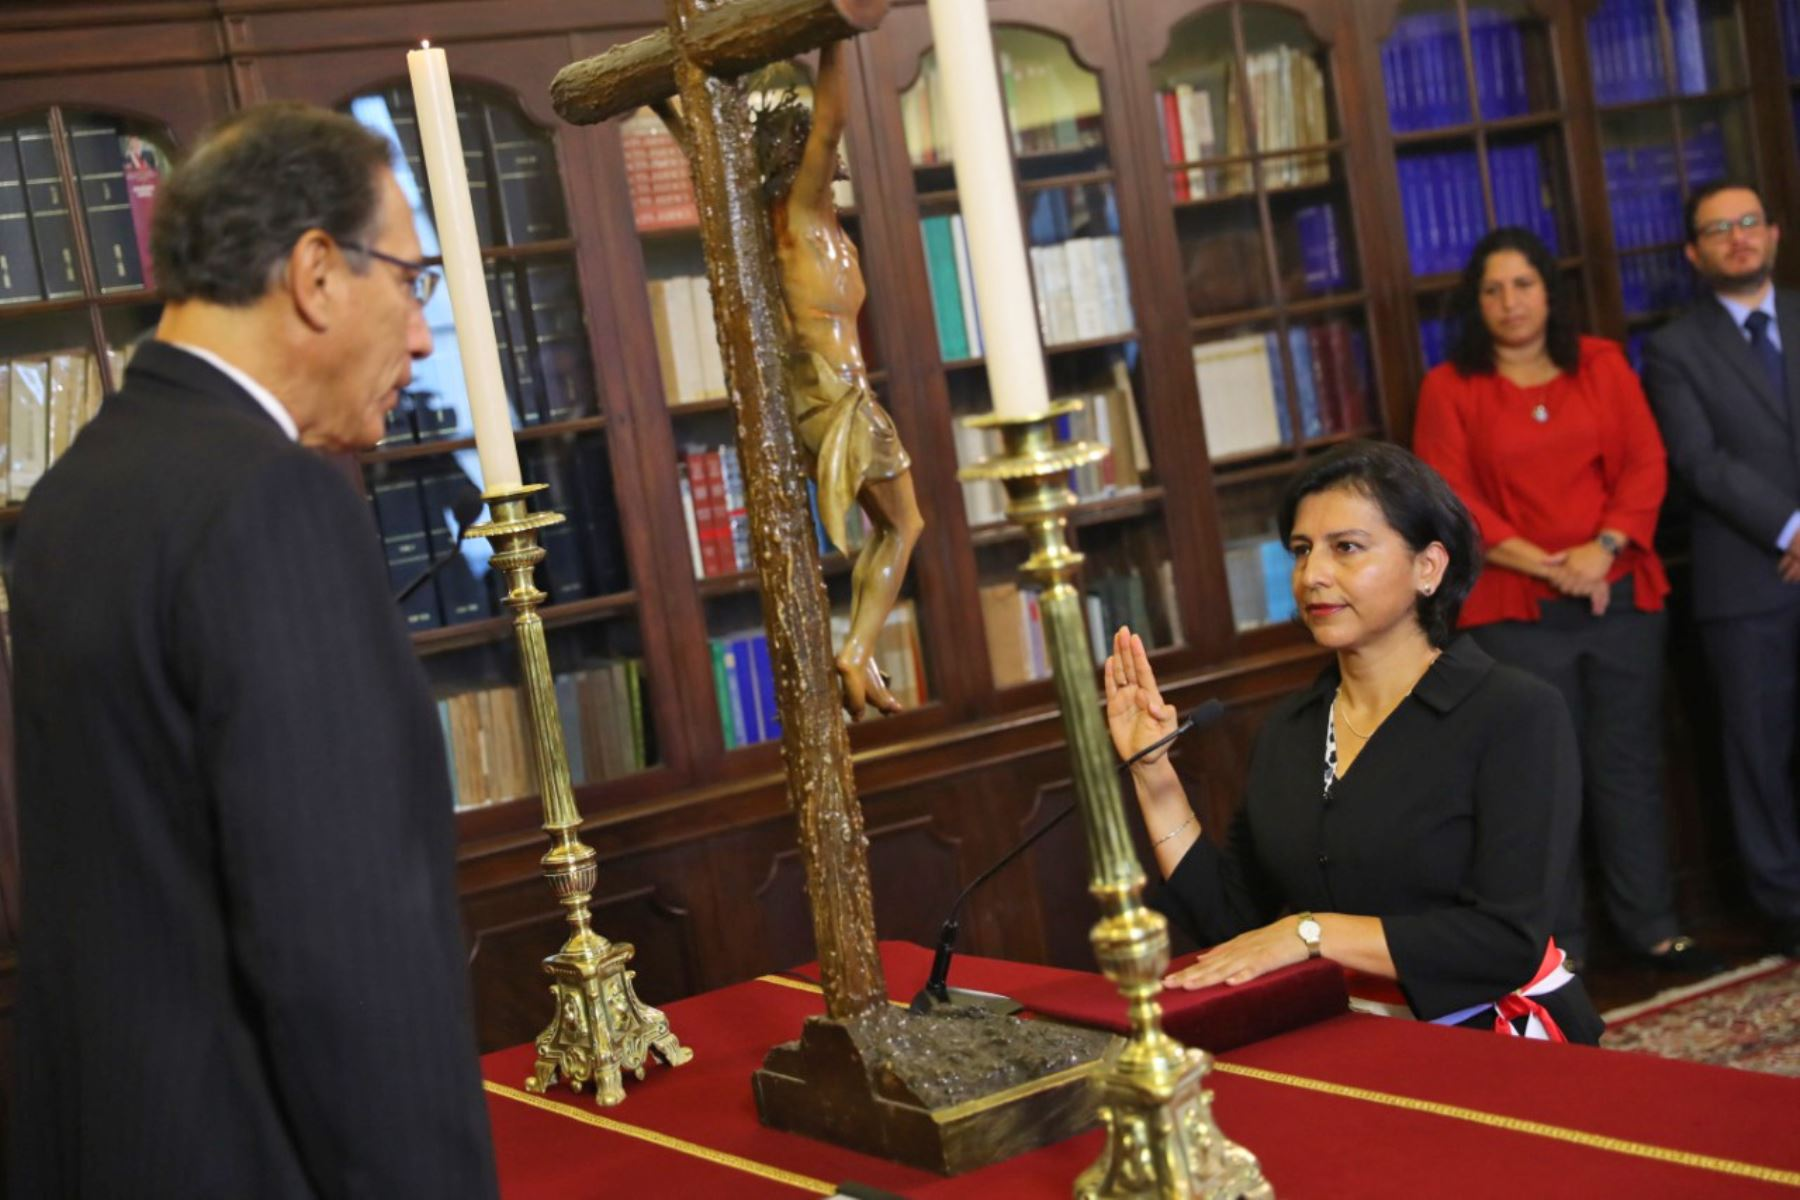 Presidente de Perú juramenta a nuevo gabinete ministerial